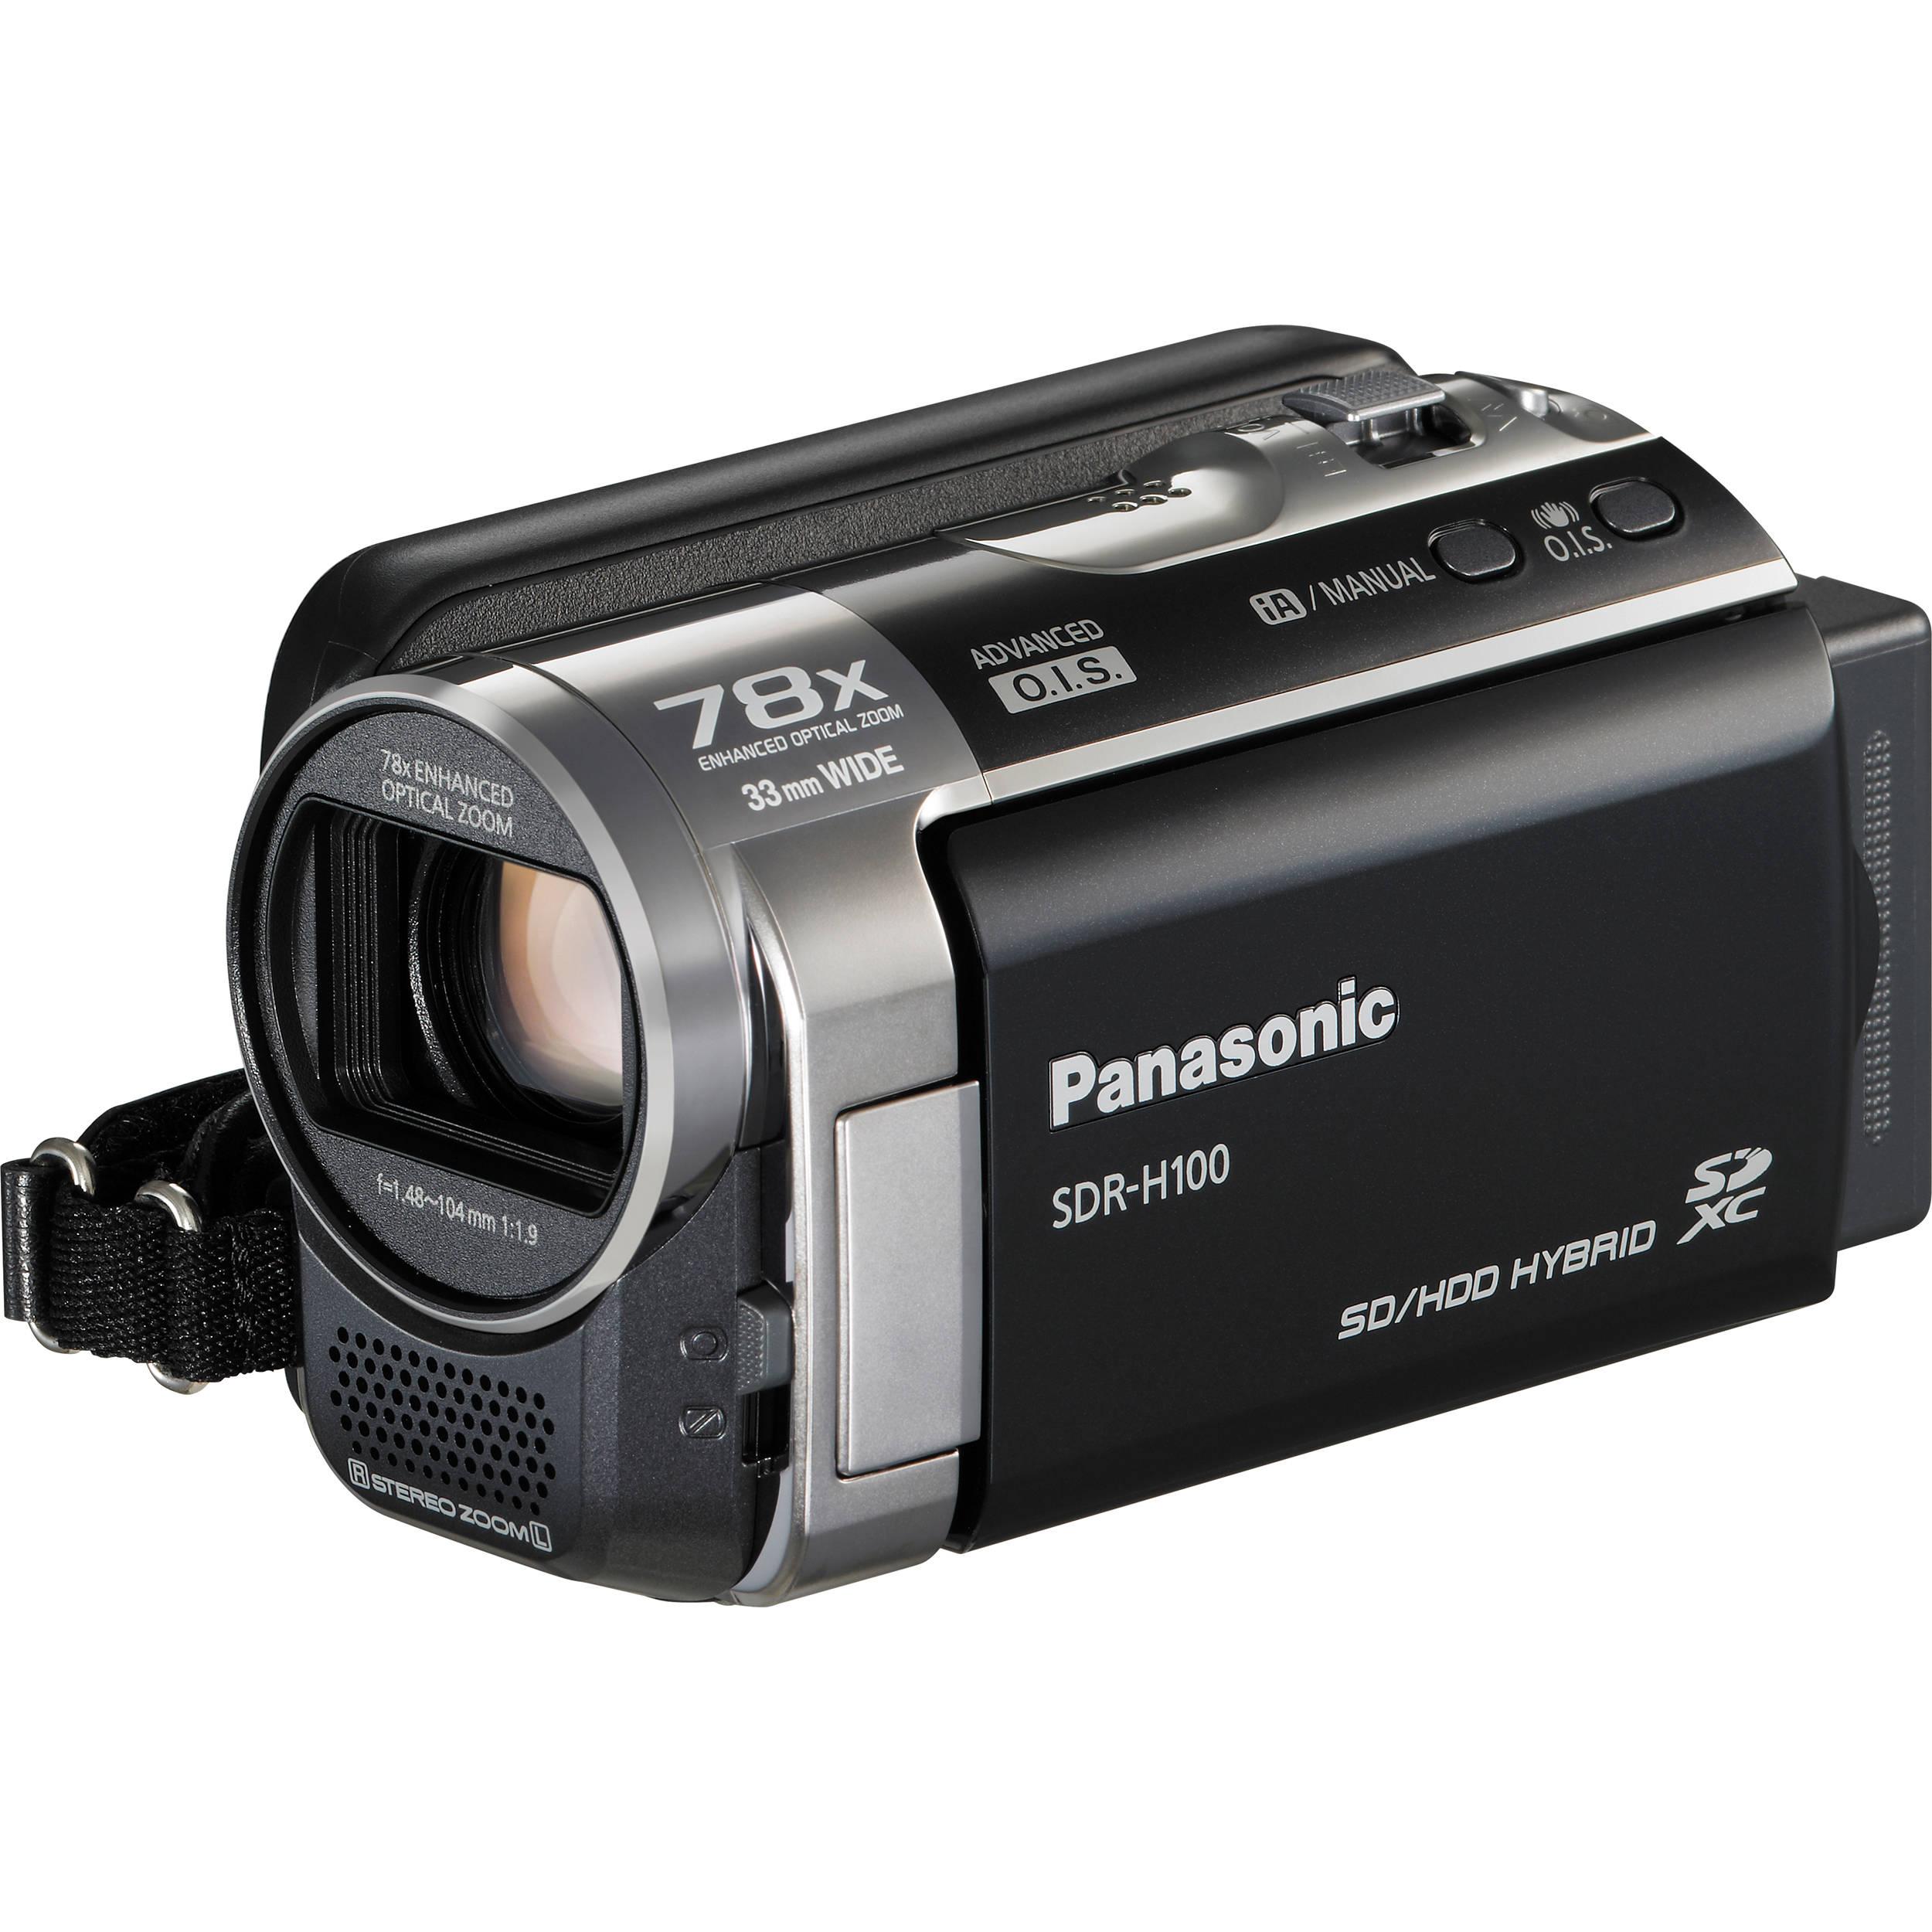 Panasonic SDR-H100 Camcorder (Black) SDR-H100K B&H Photo Video